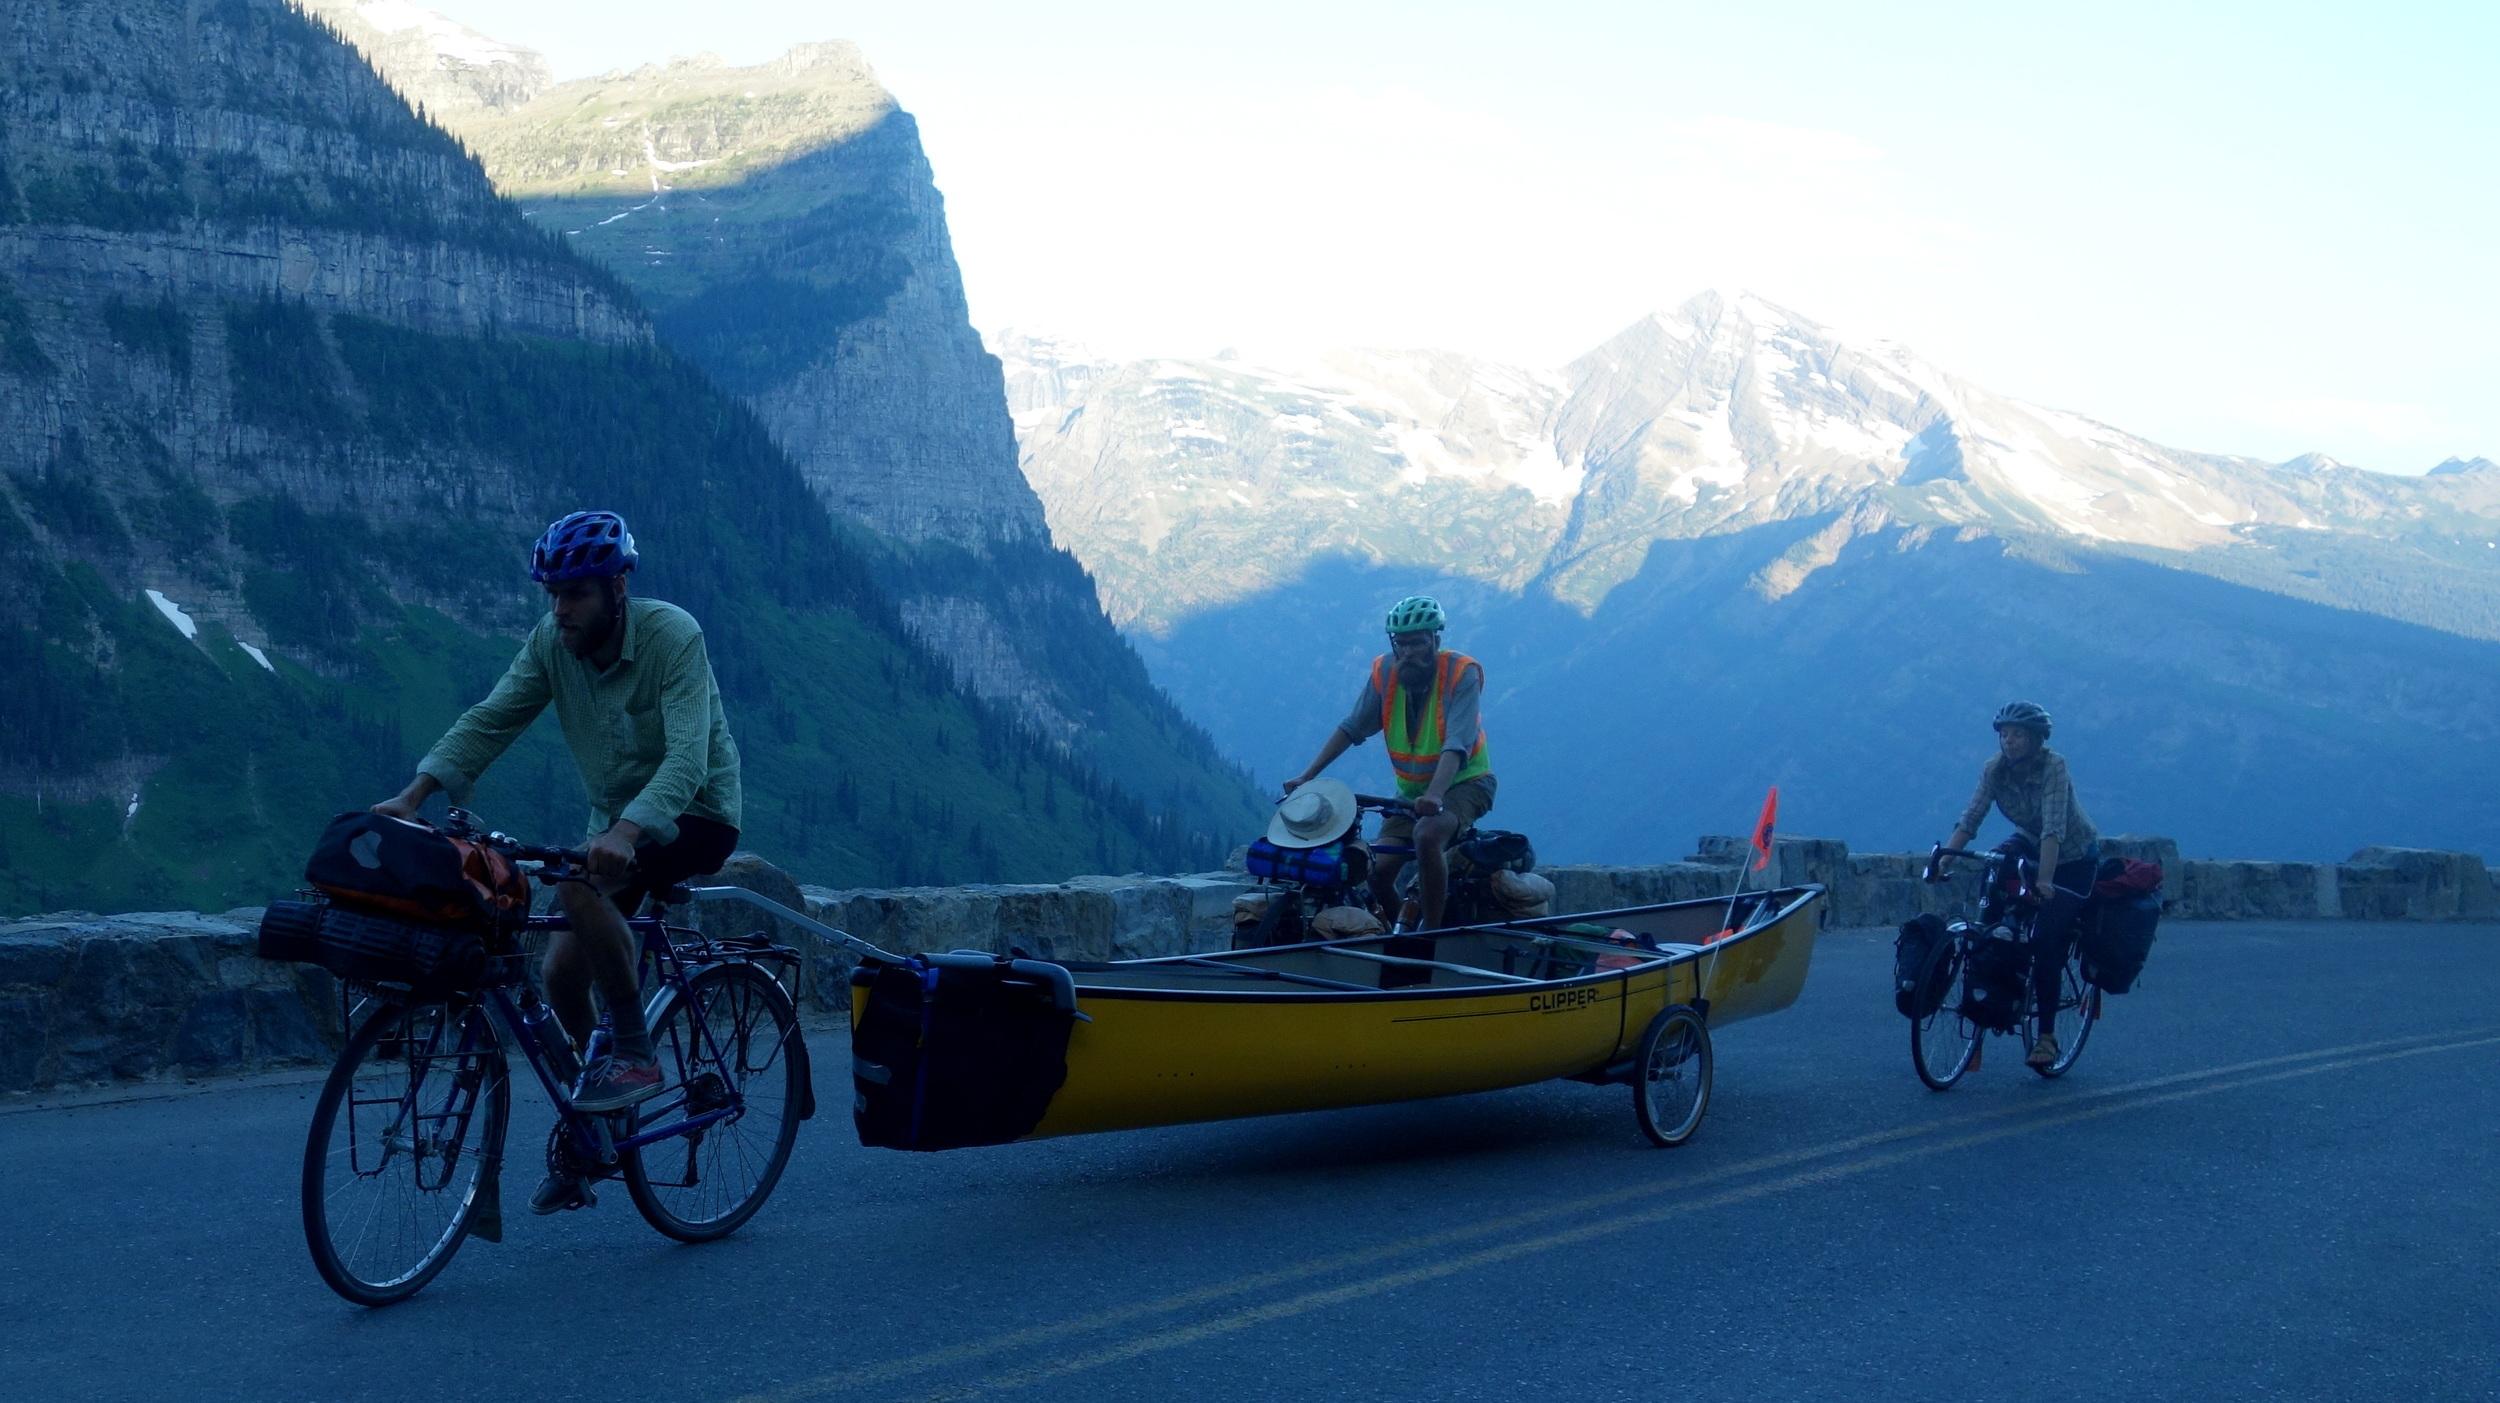 Me gusta ideas aunque ideas locas como andar en bici con canoa sobre una montana.